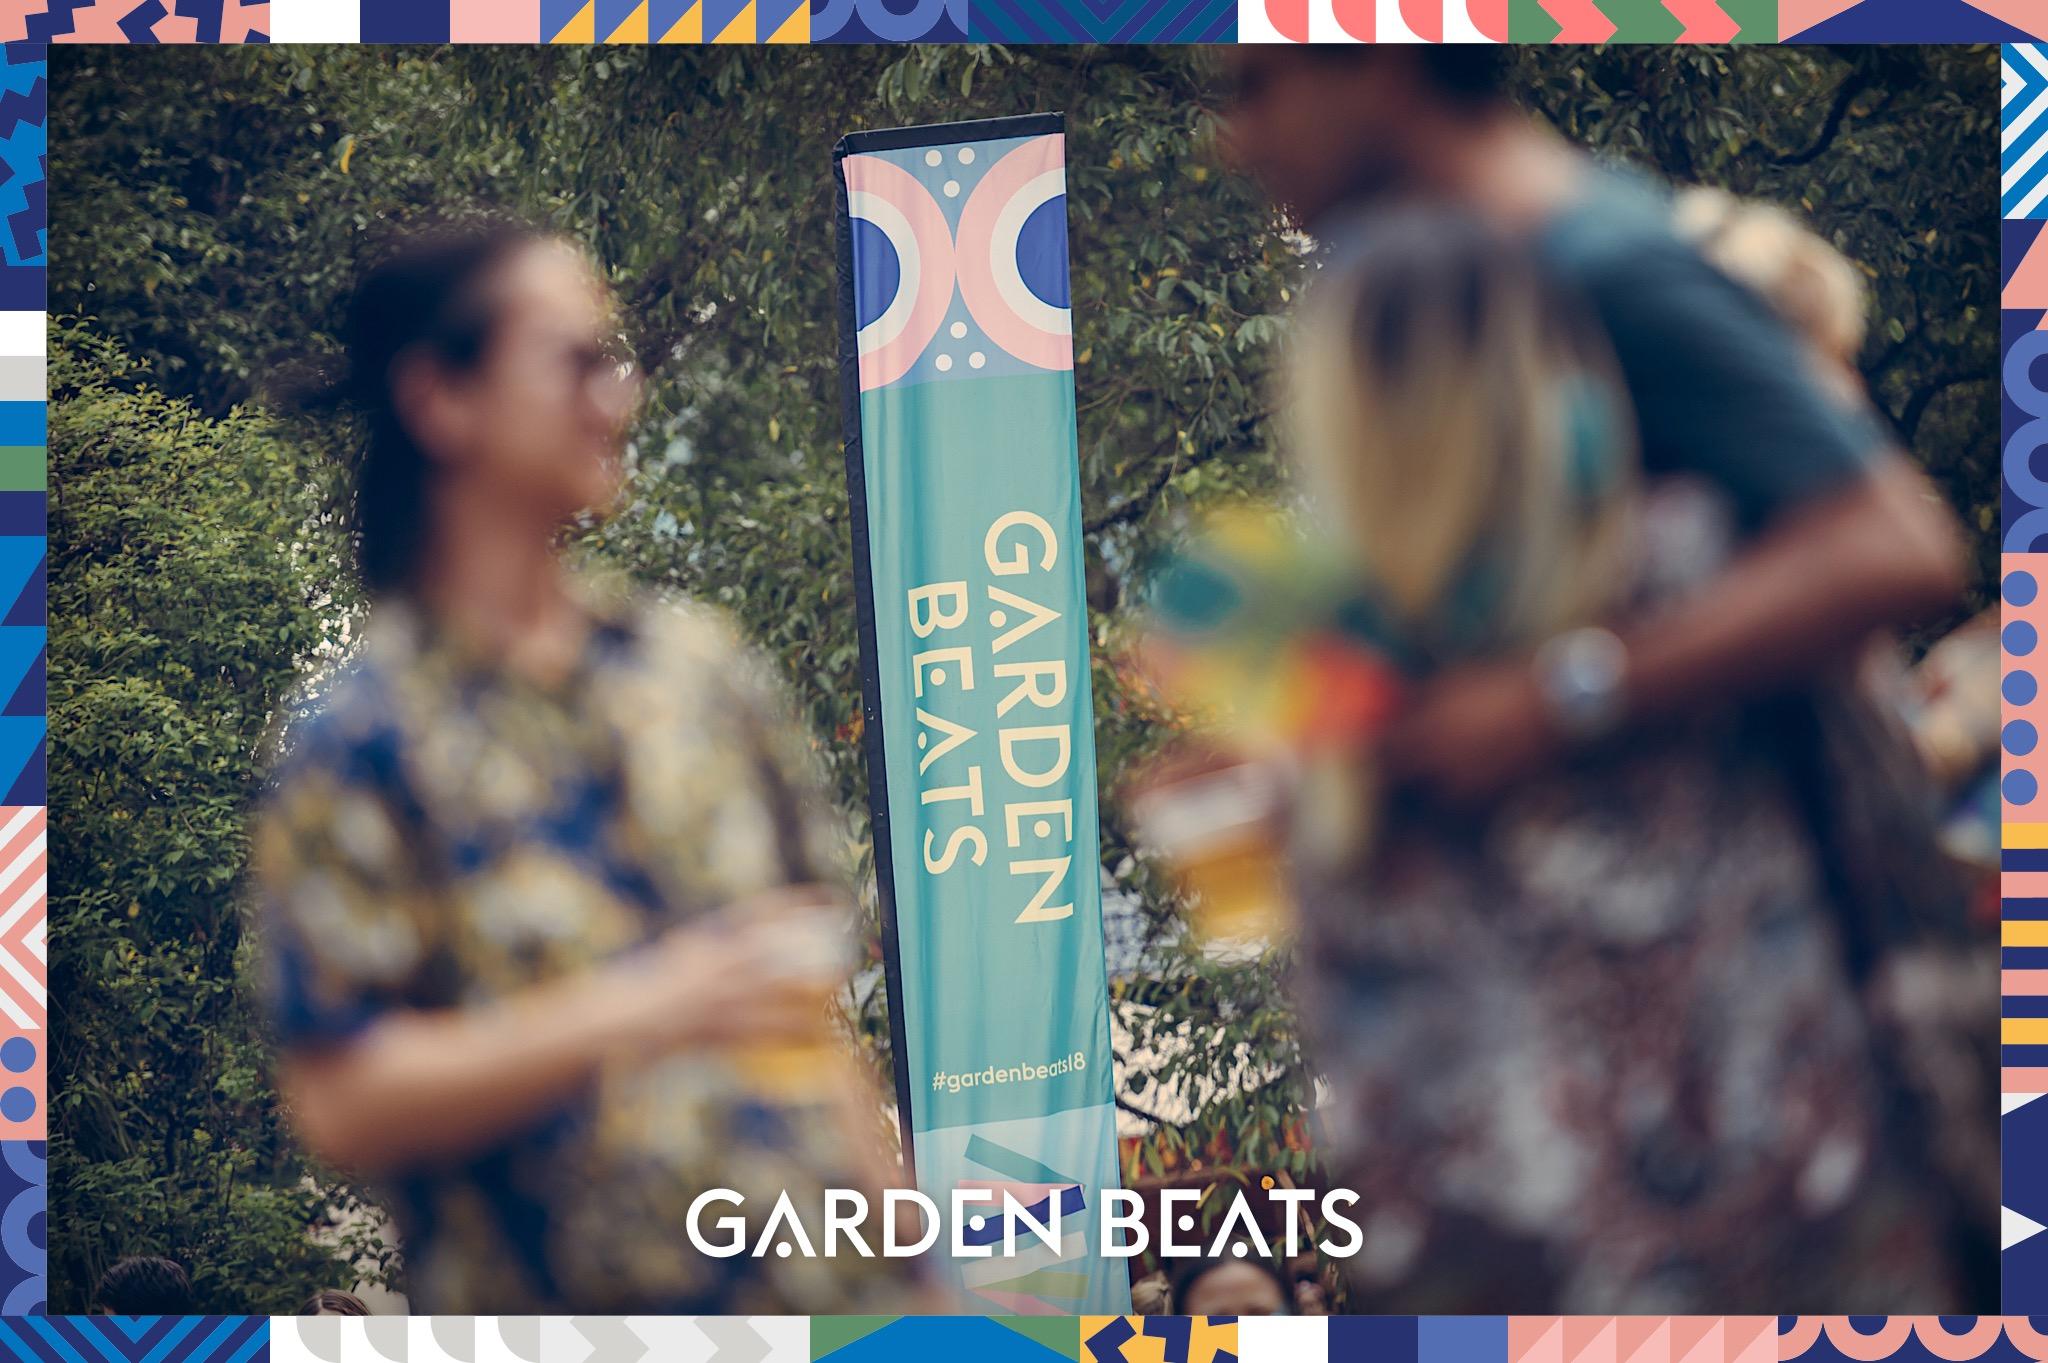 03032018_GardenBeats_Colossal455_Watermarked.jpg